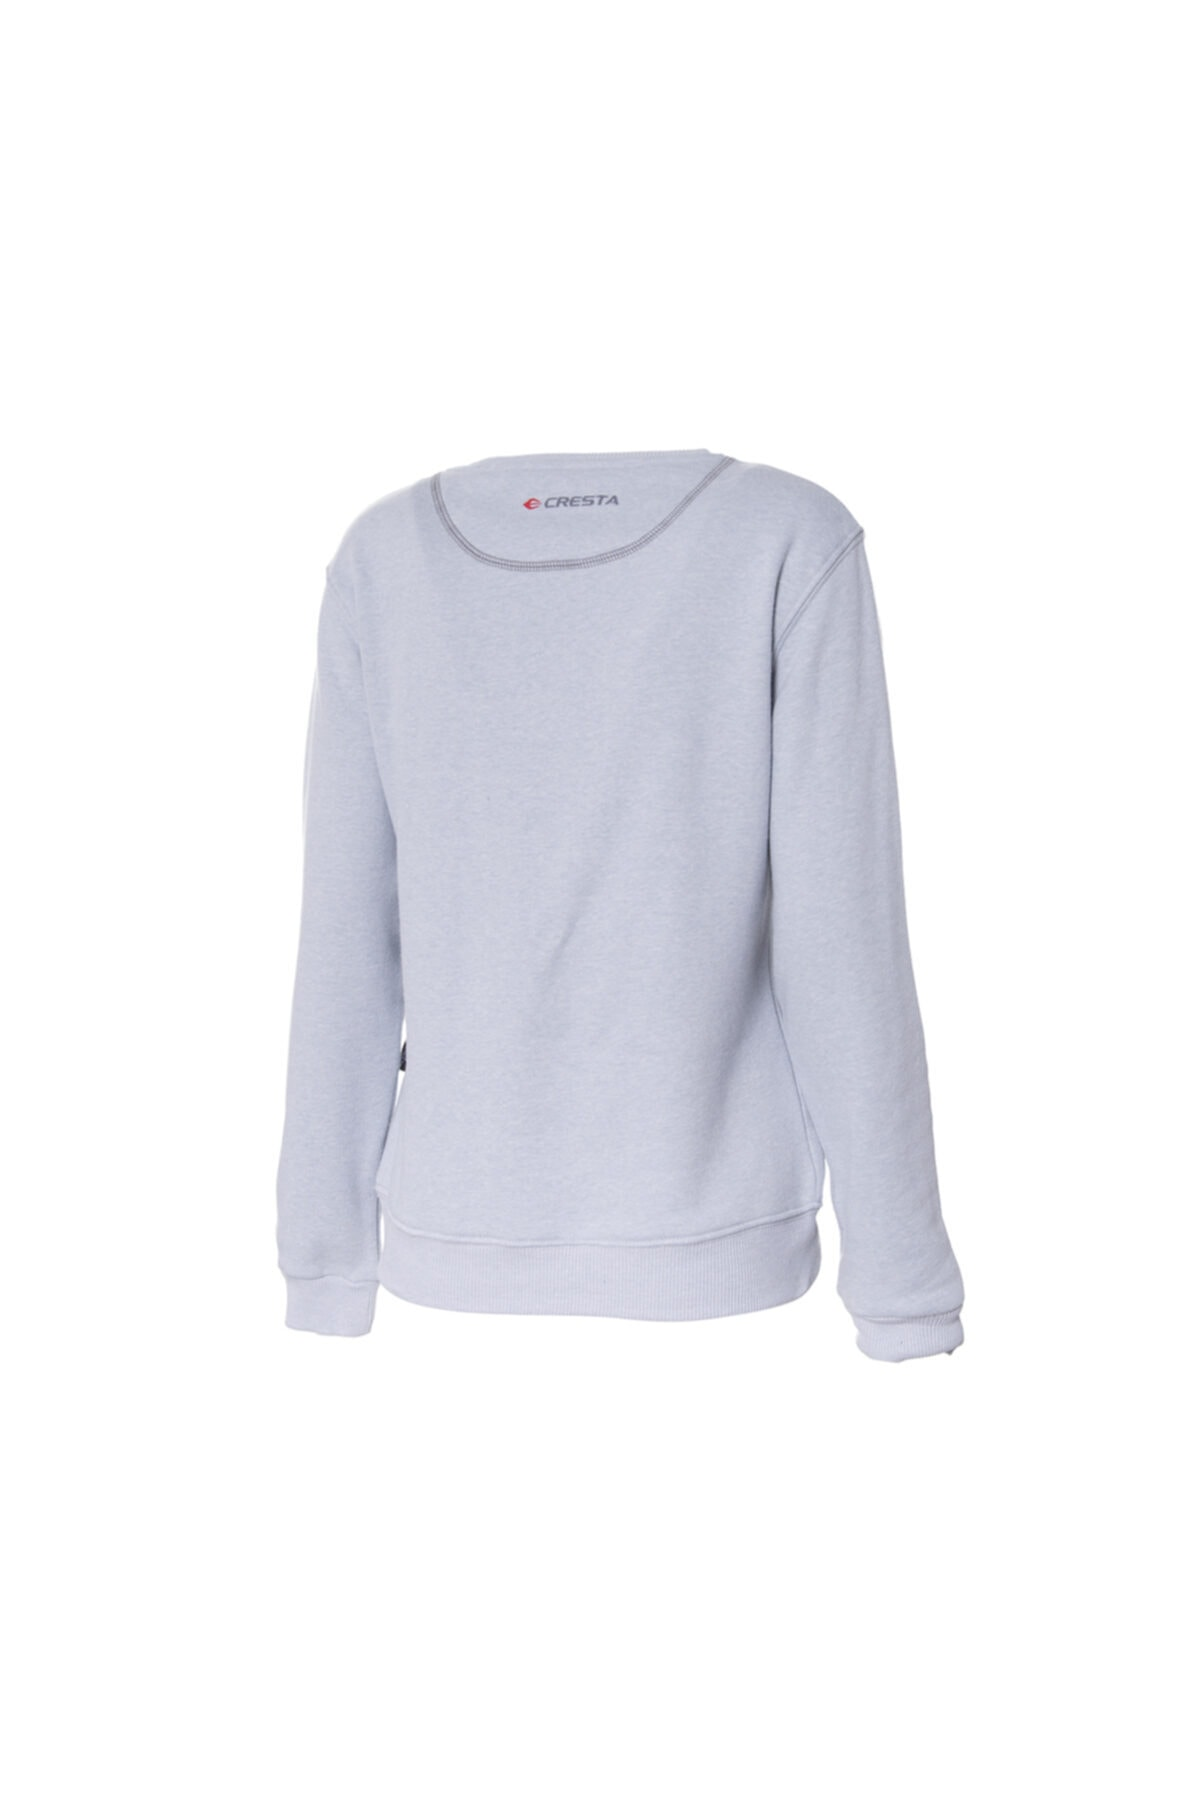 Cresta Kadın Gri Basic Outdoor Sweatshirt 2